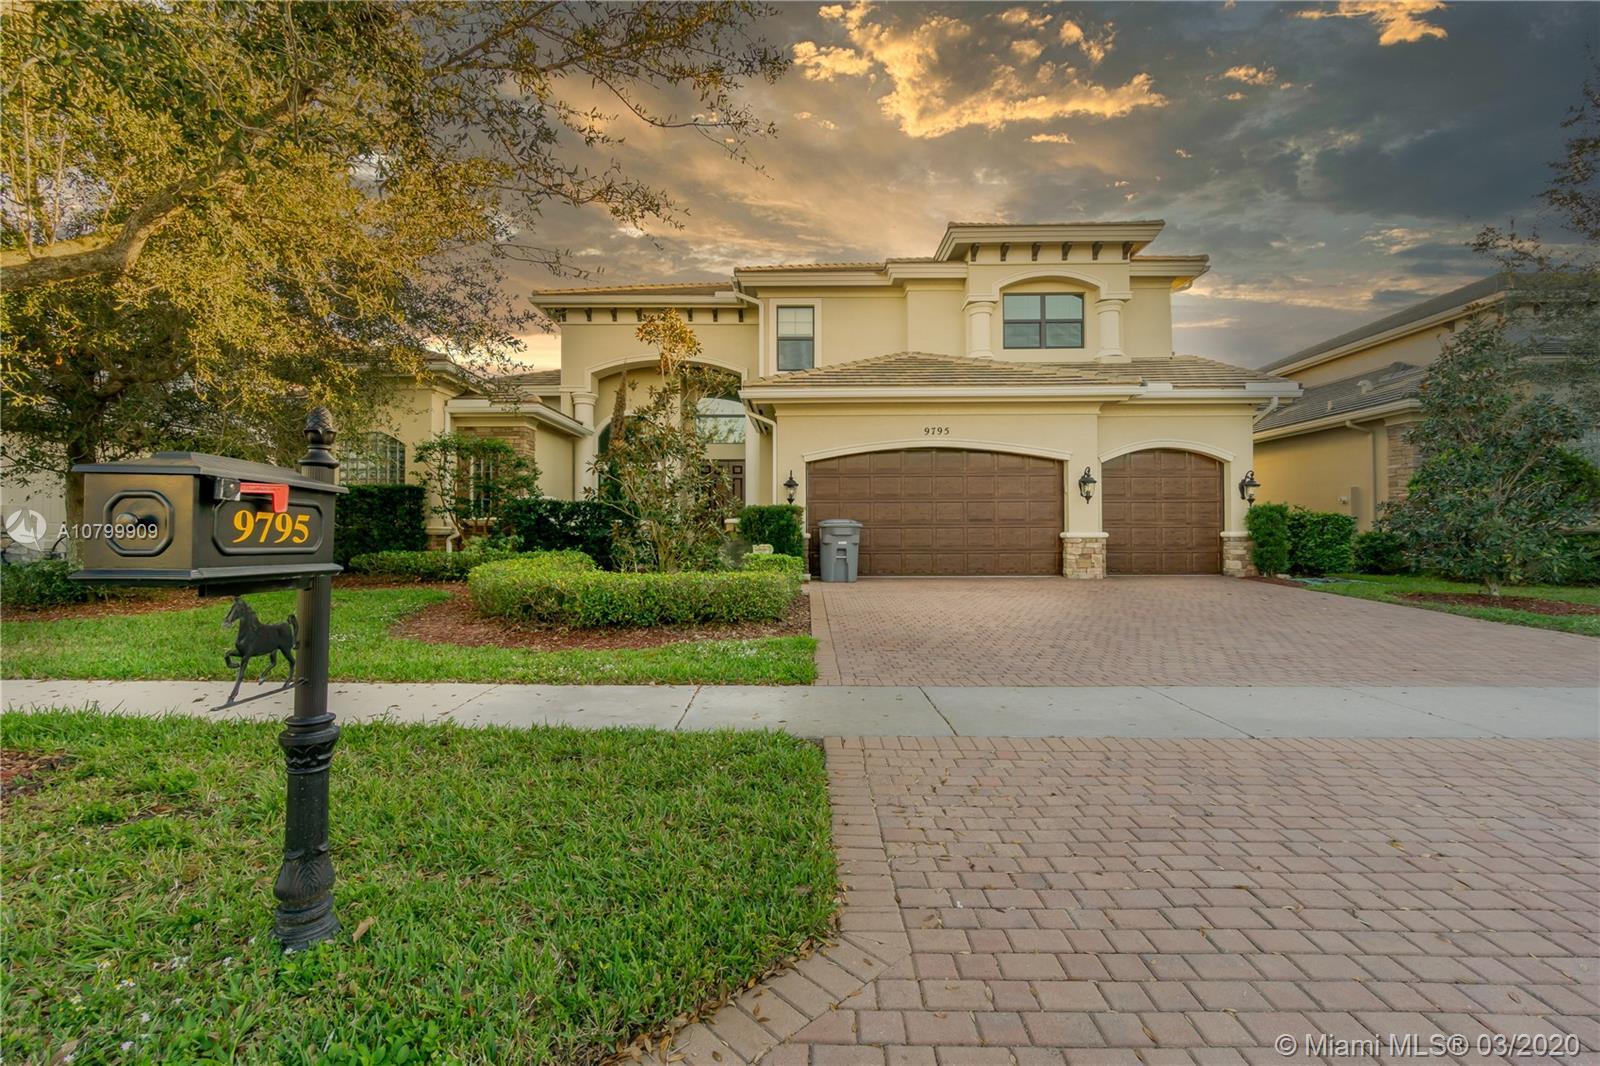 9795 Equus Cir Property Photo - Boynton Beach, FL real estate listing